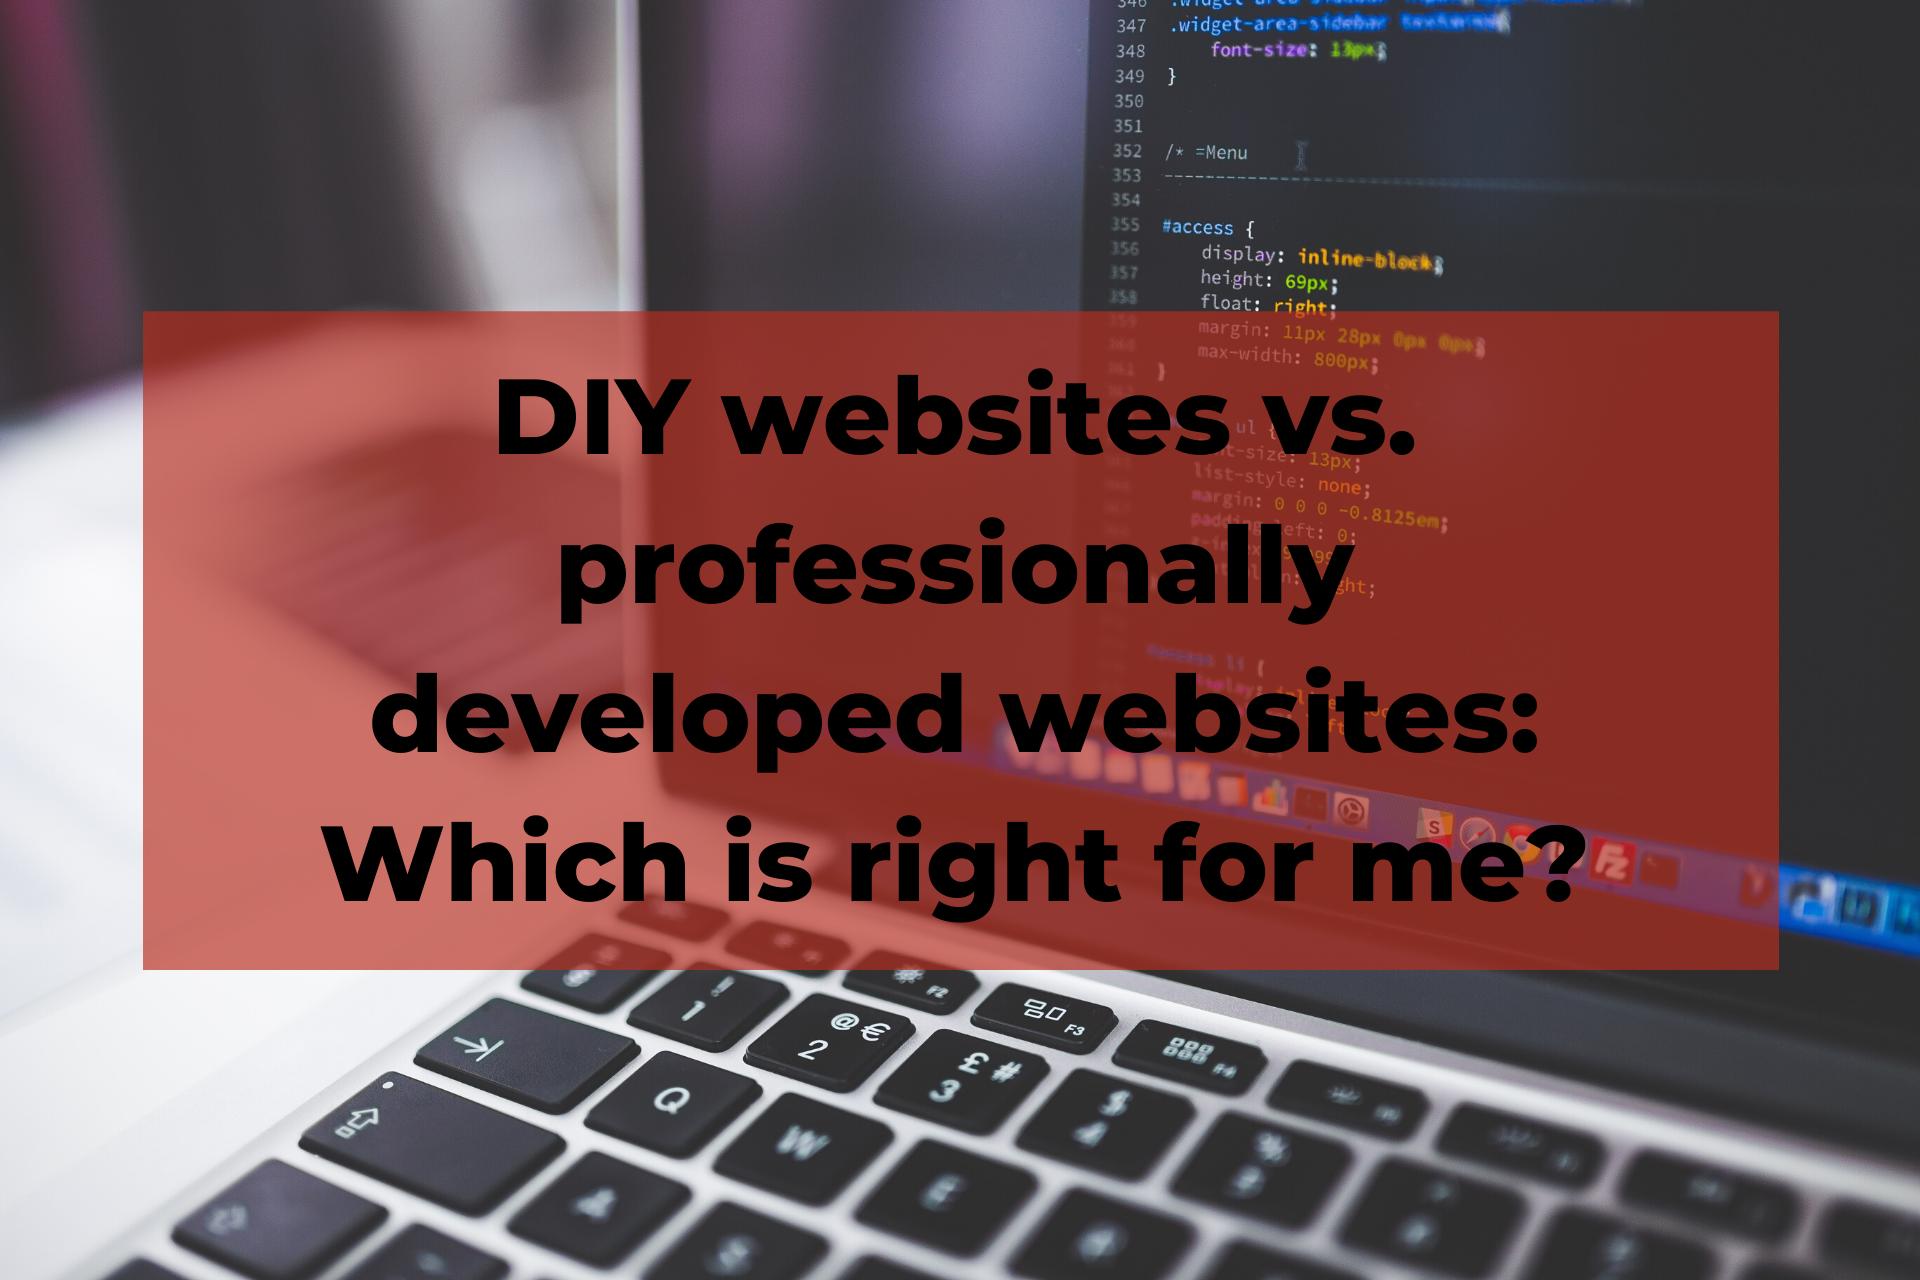 DIY websites vs professionally developed